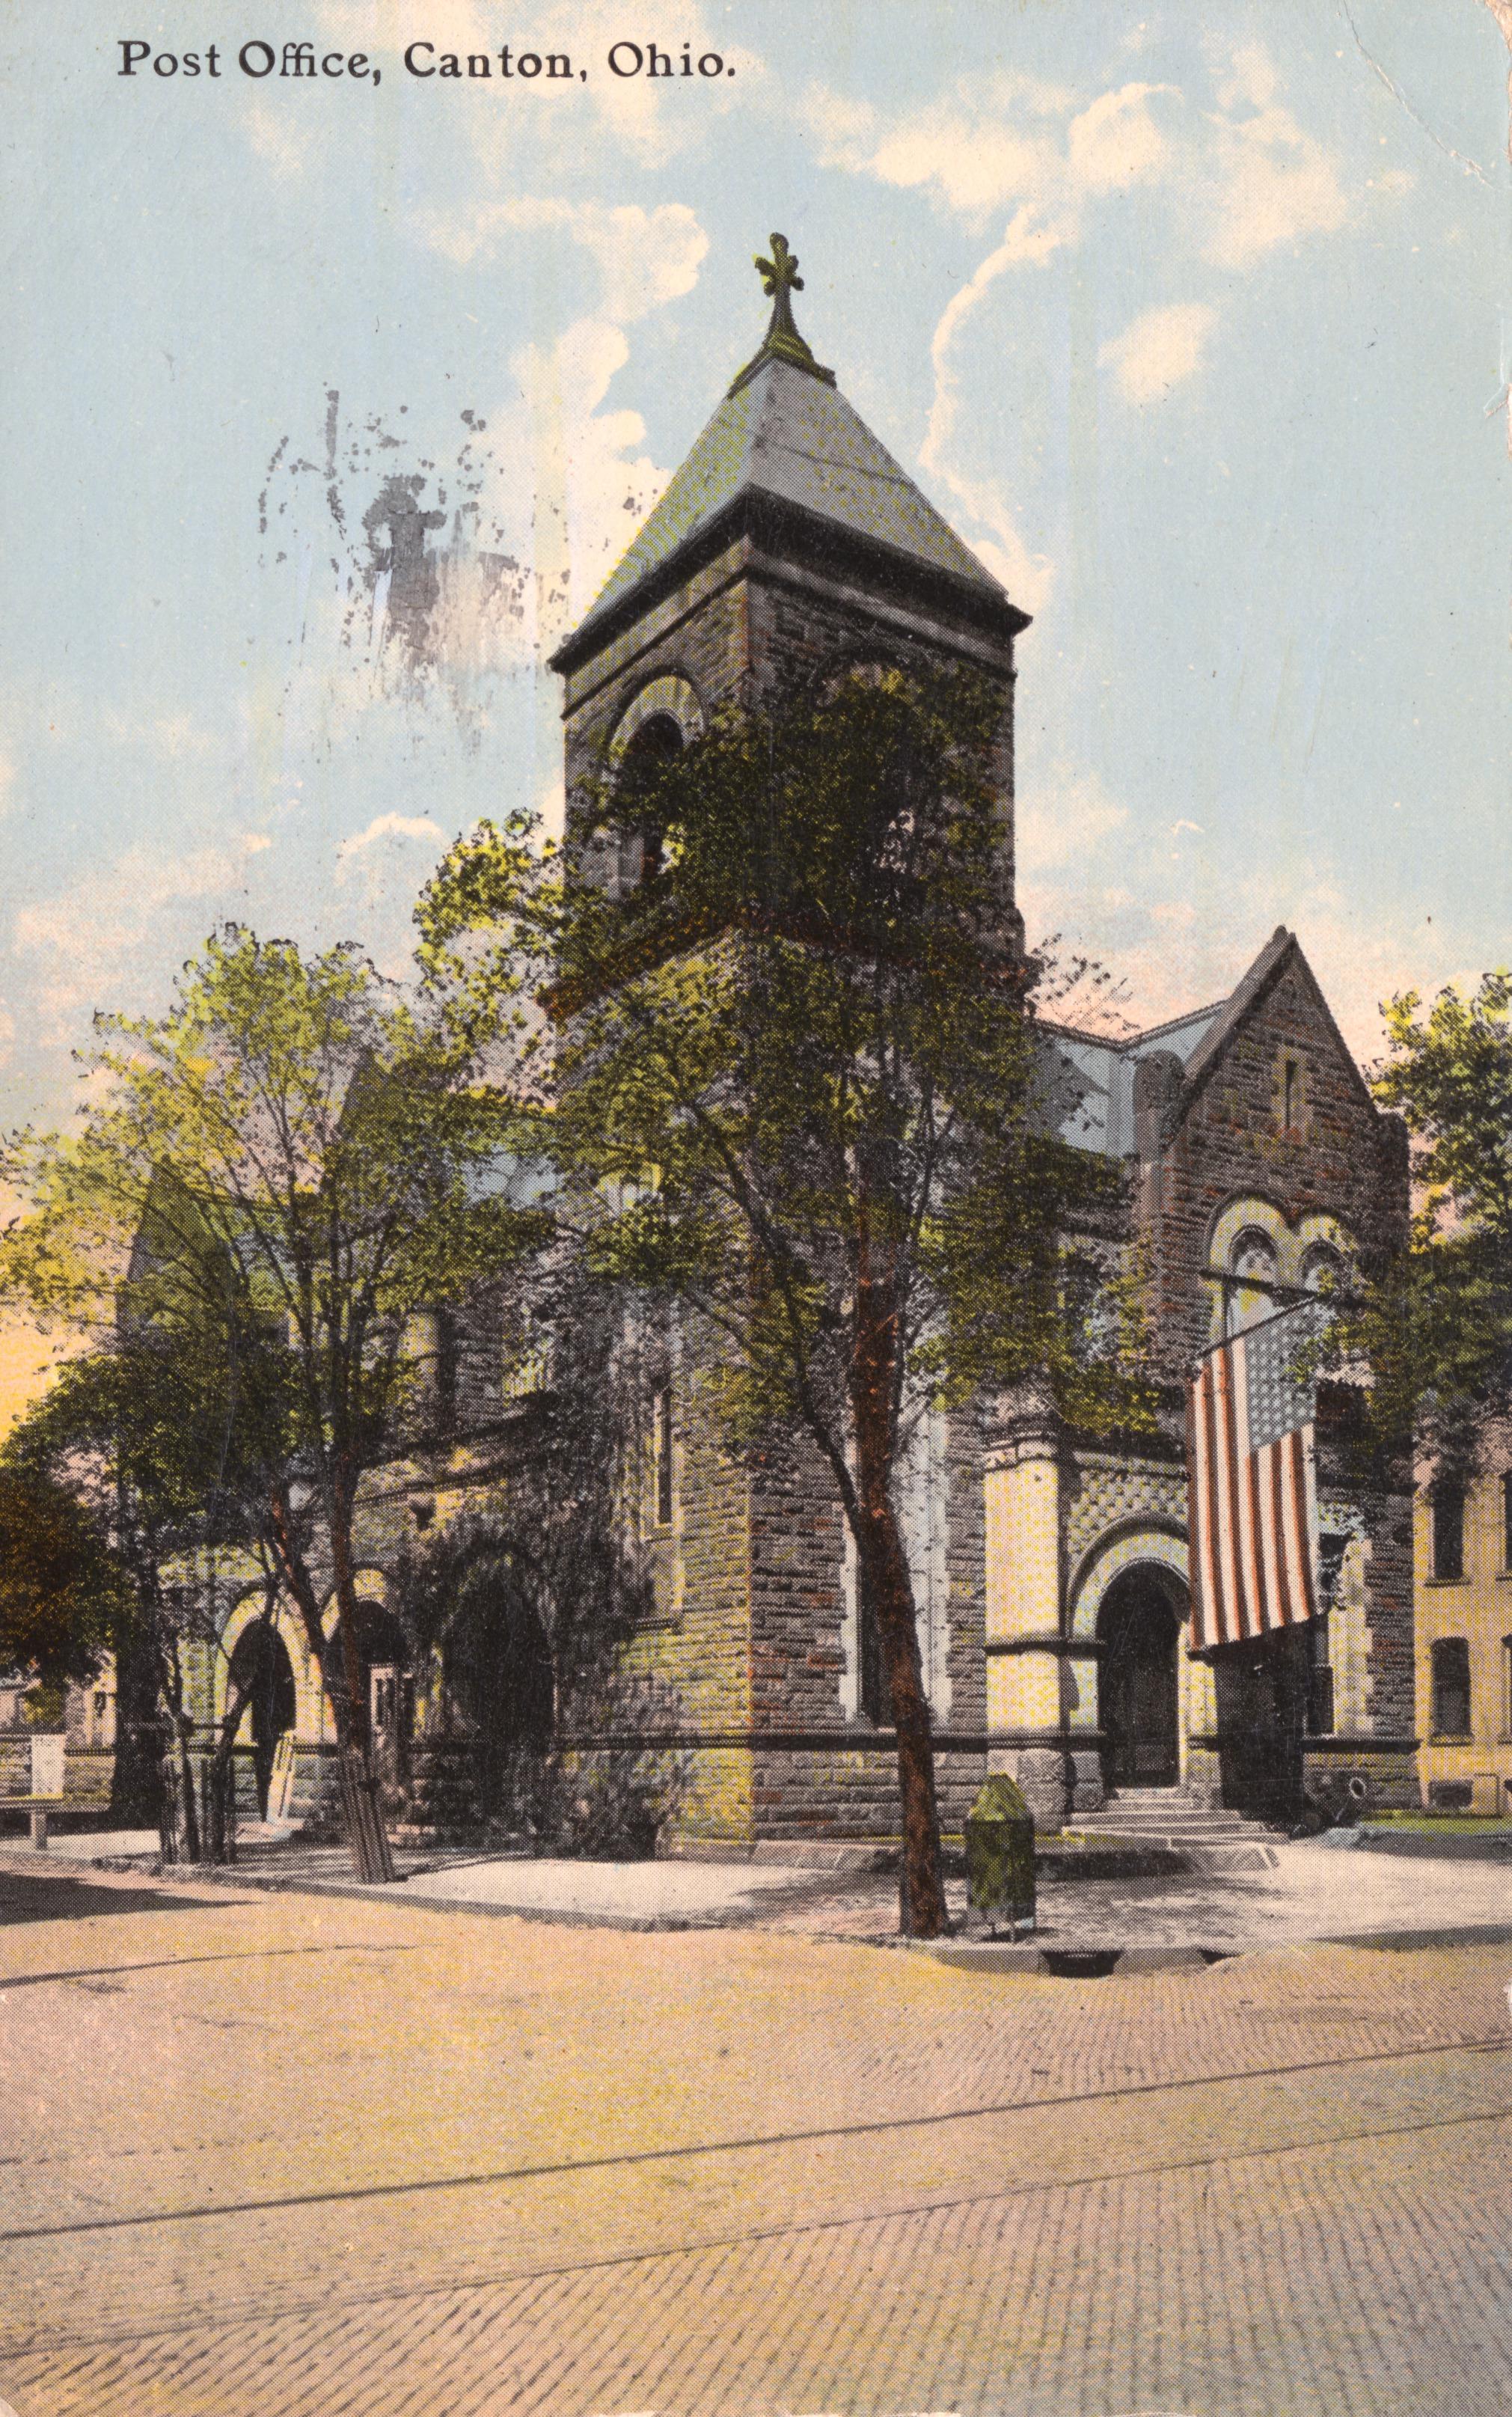 File:Post Office, Canton, Ohio. (14091337824)